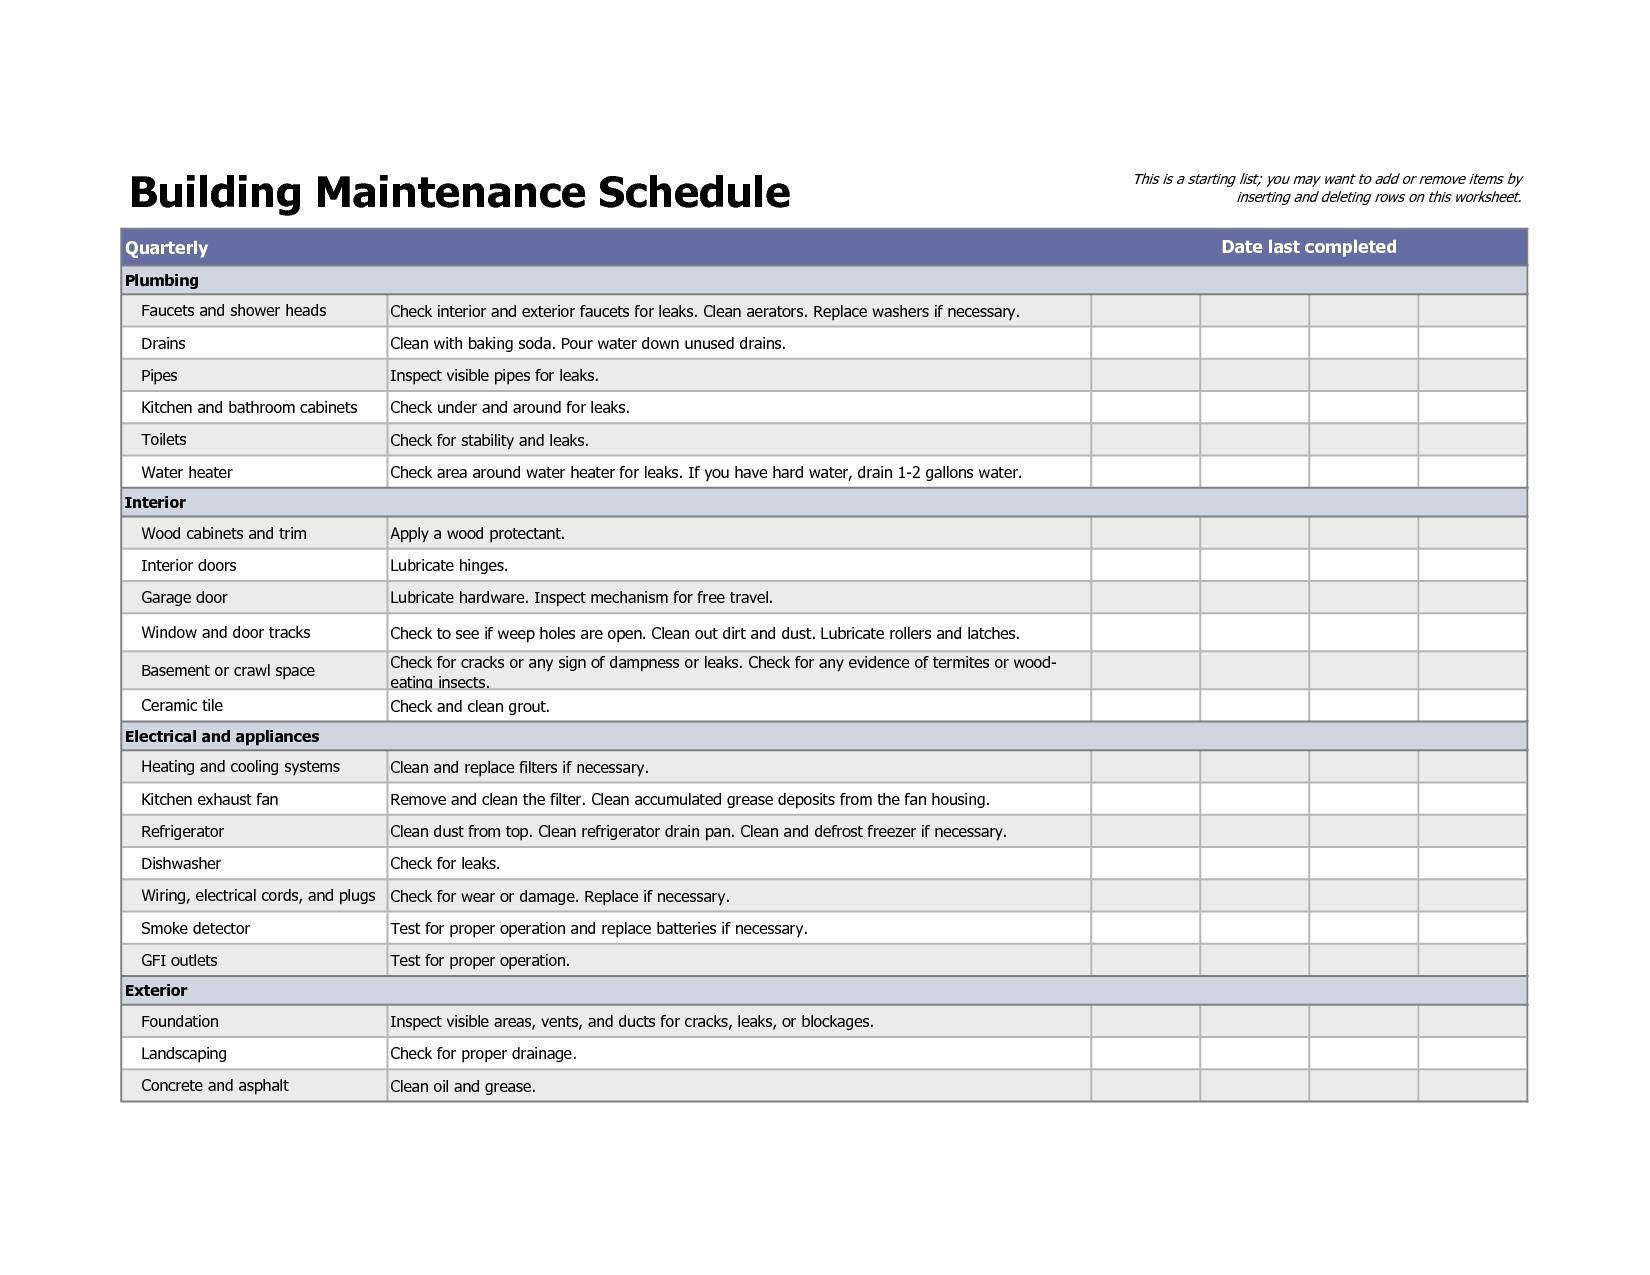 Building Maintenance Schedule Excel Template